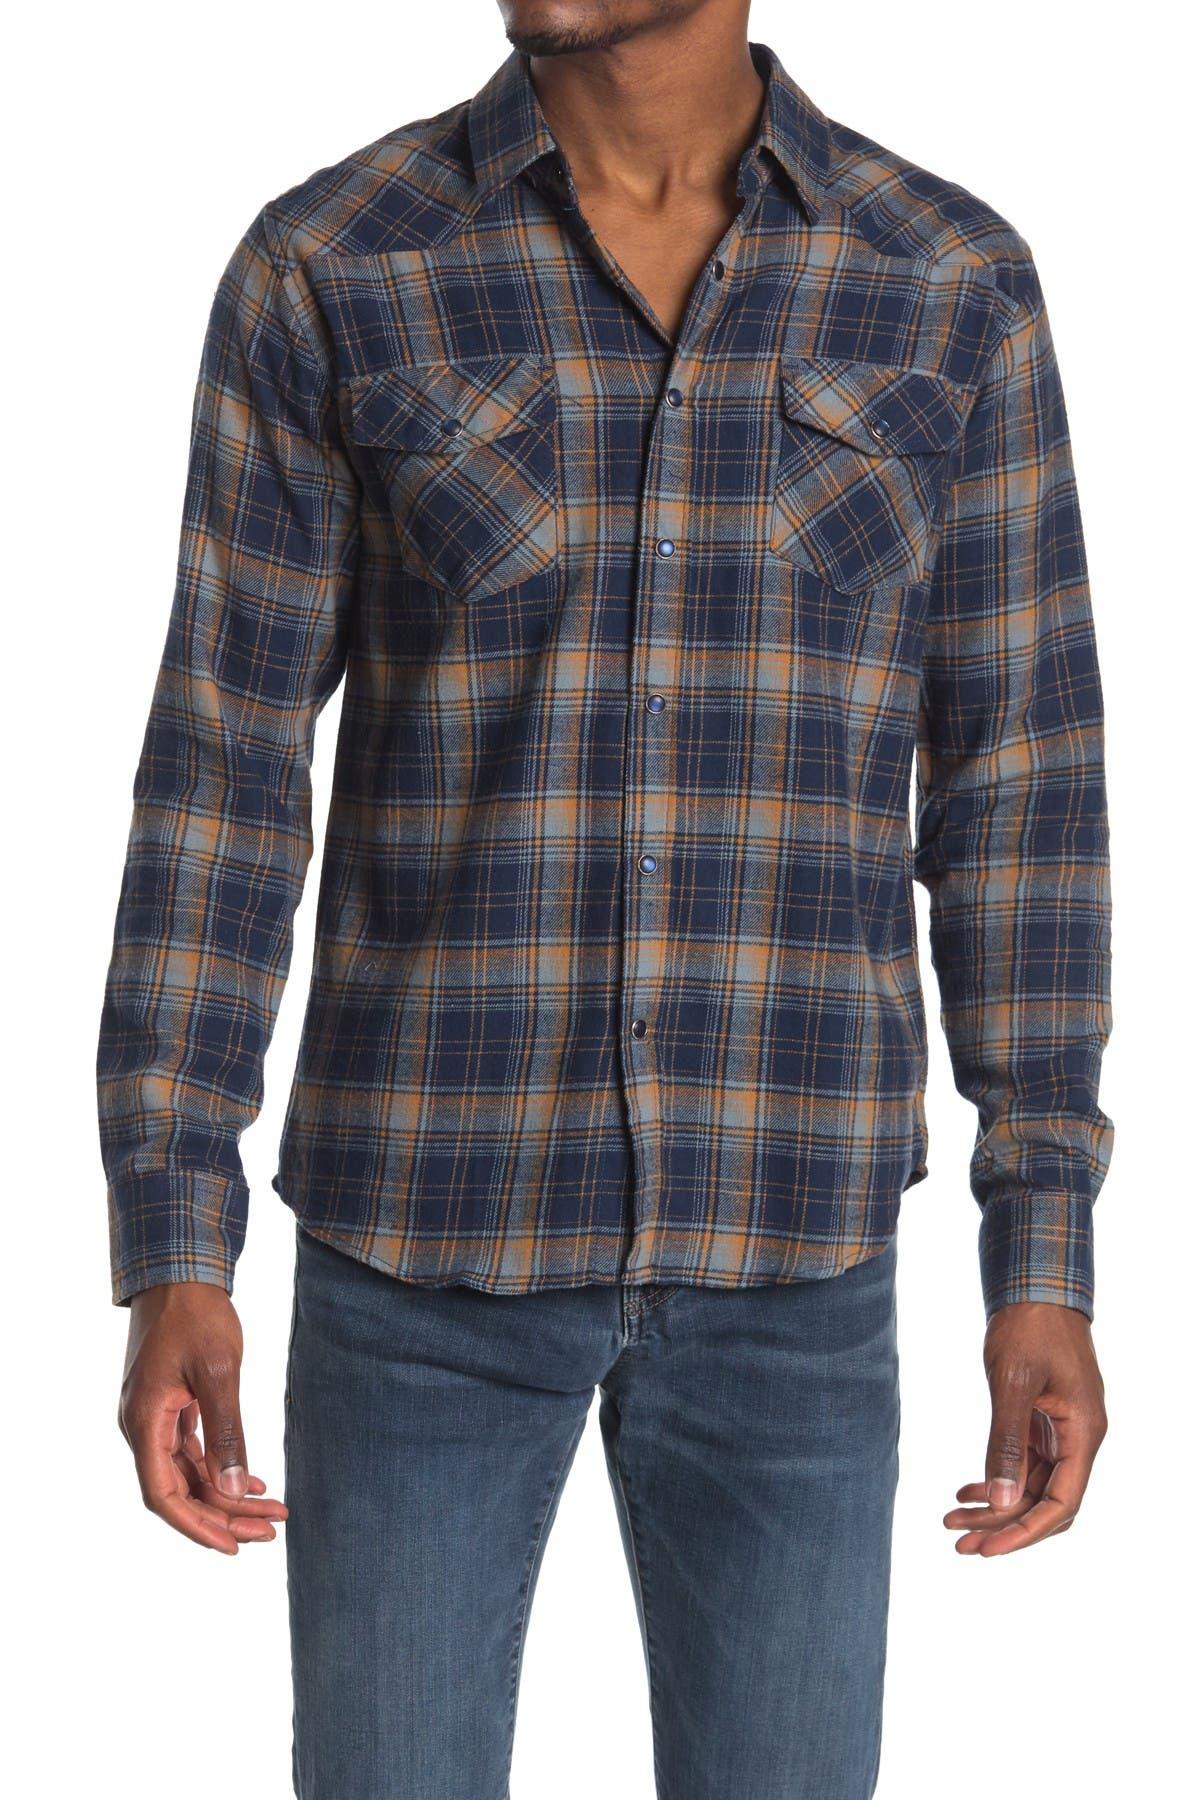 Image of Coastal Everett Brushed Cotton Flannel